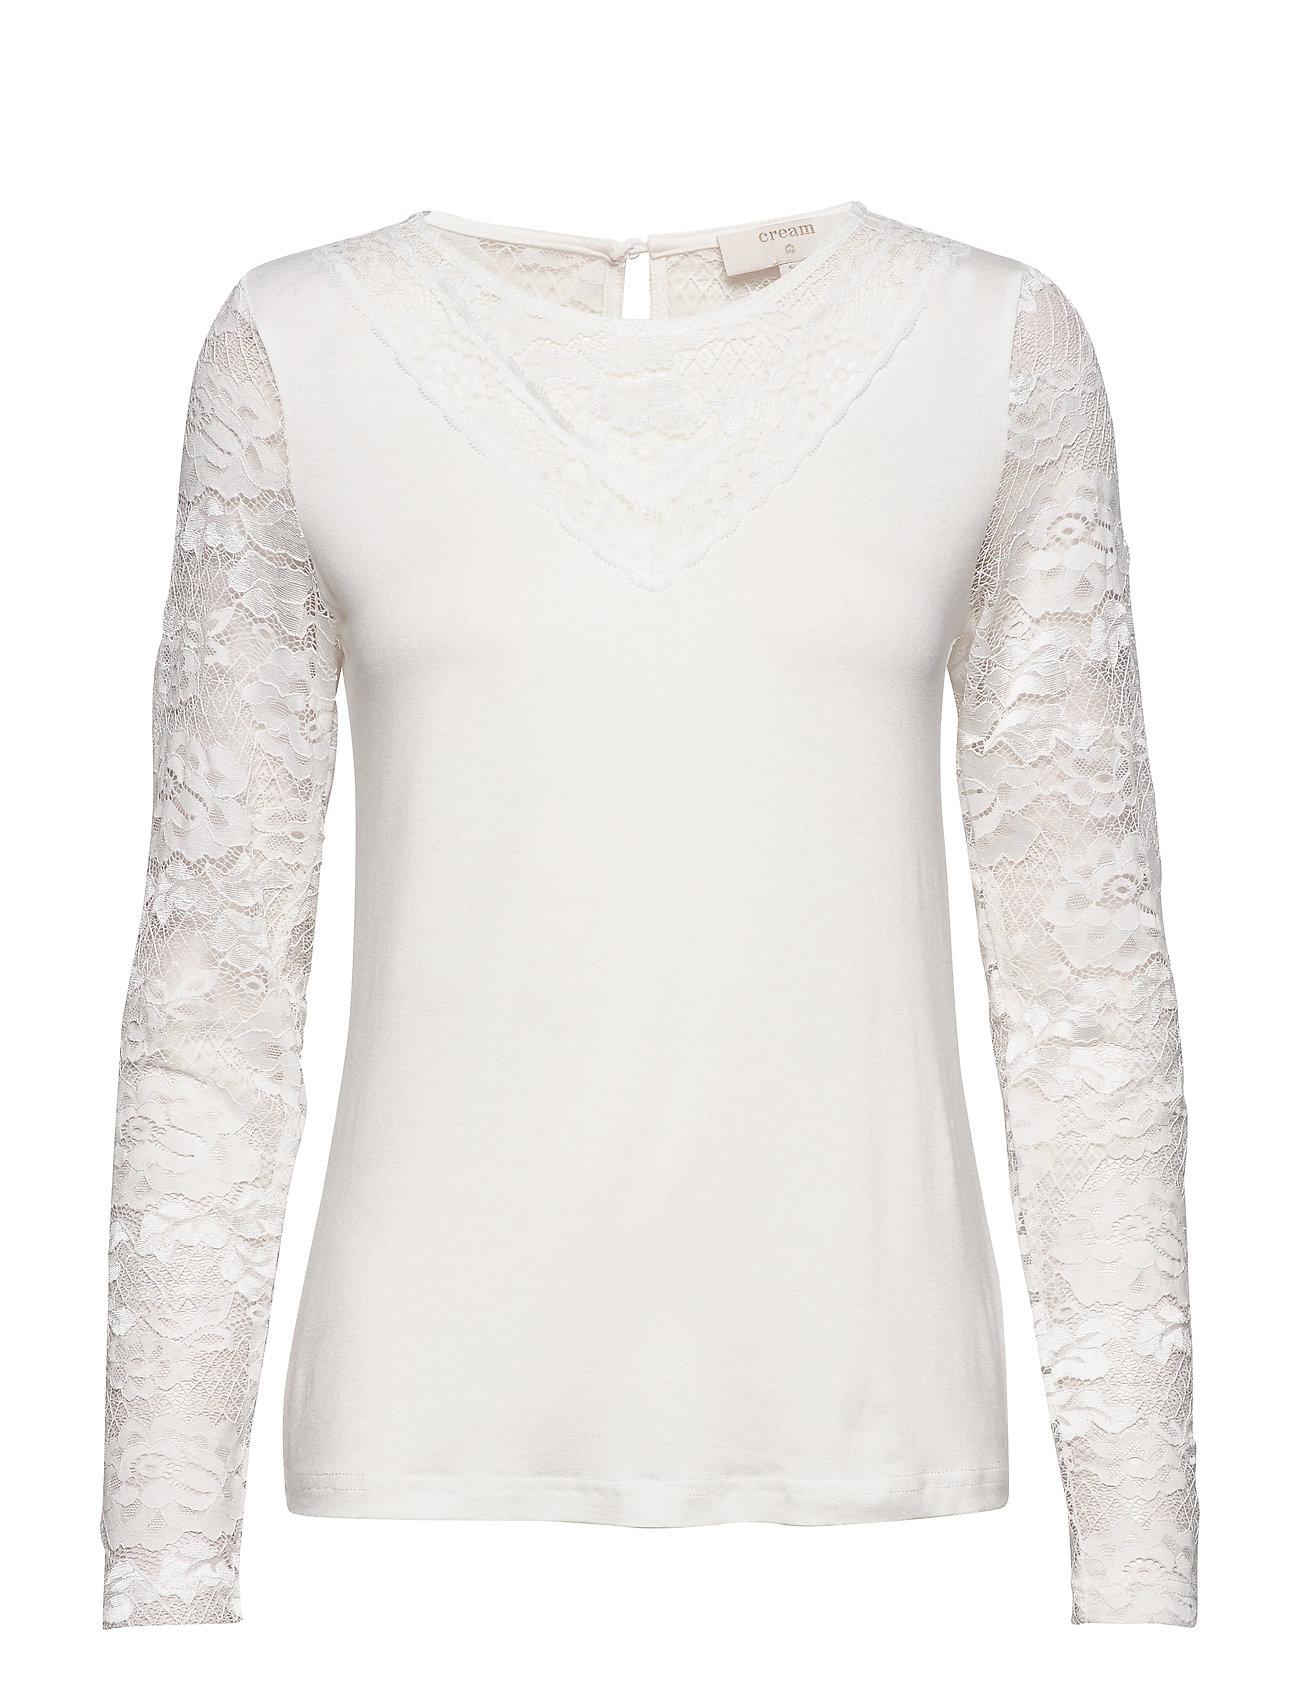 Cream KaneCR Long Sleeve T-shirt - CHALK